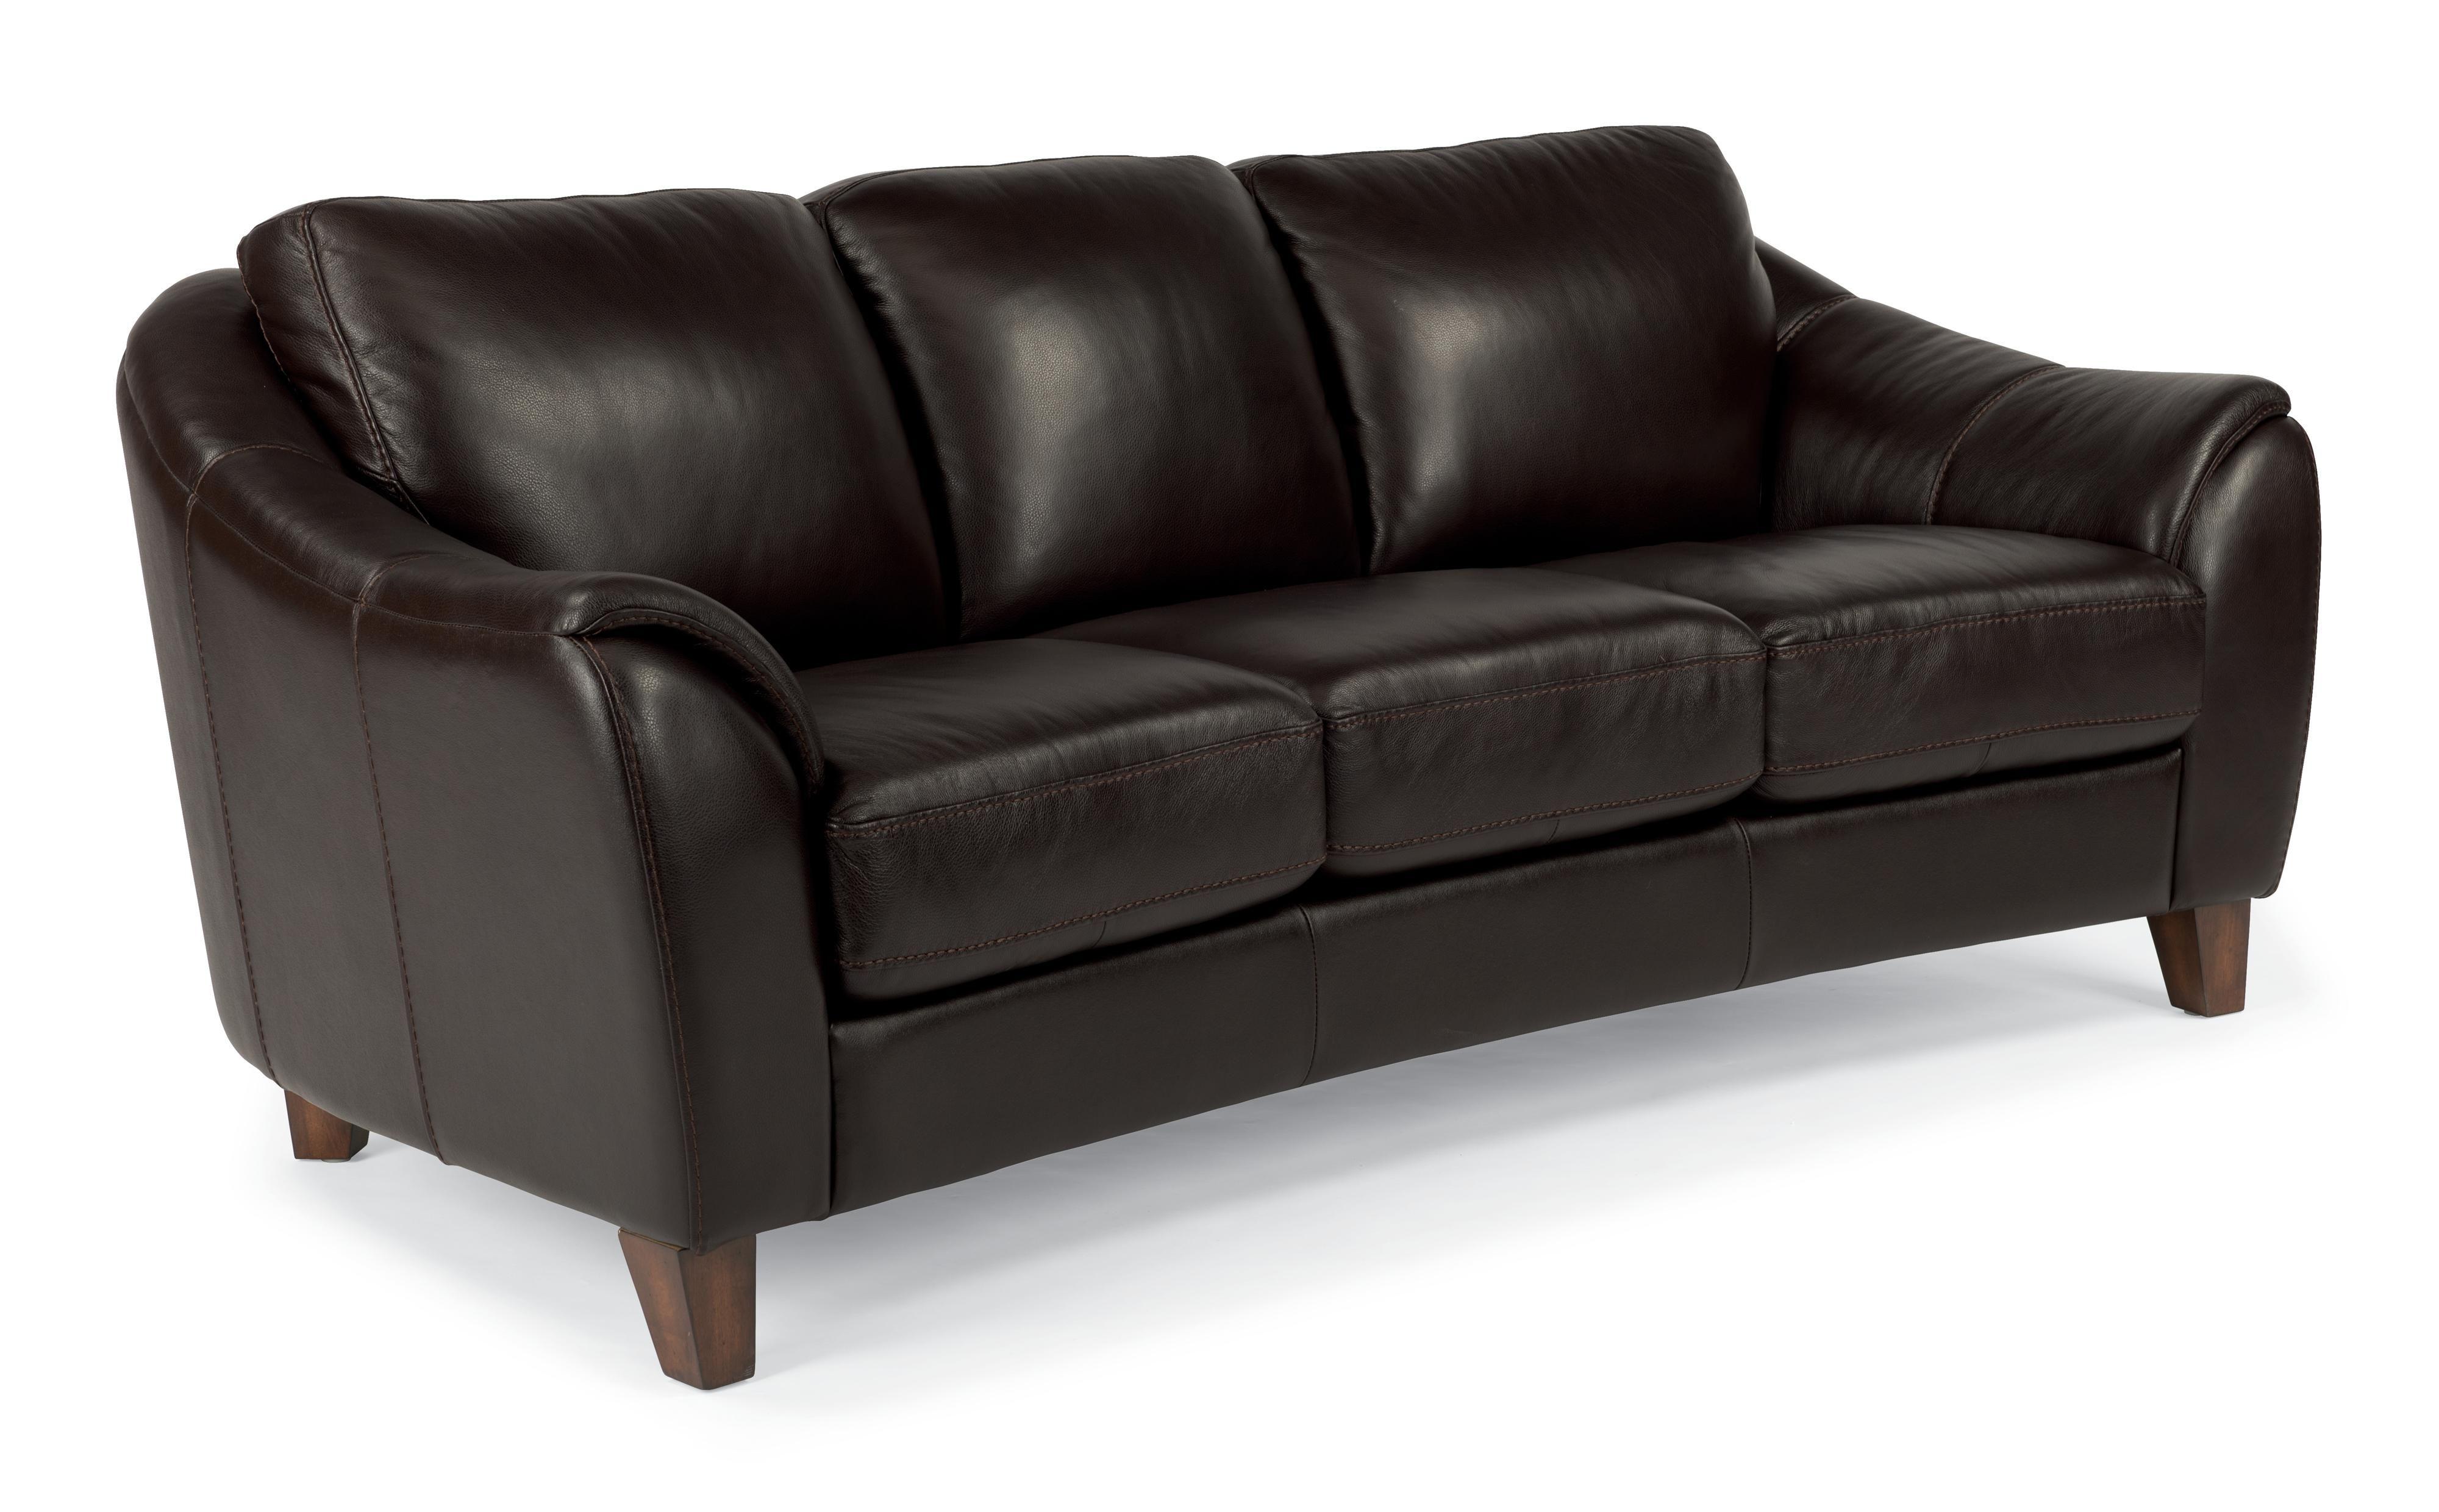 Flexsteel Latitudes-Lidia Contemporary Leather Sofa With